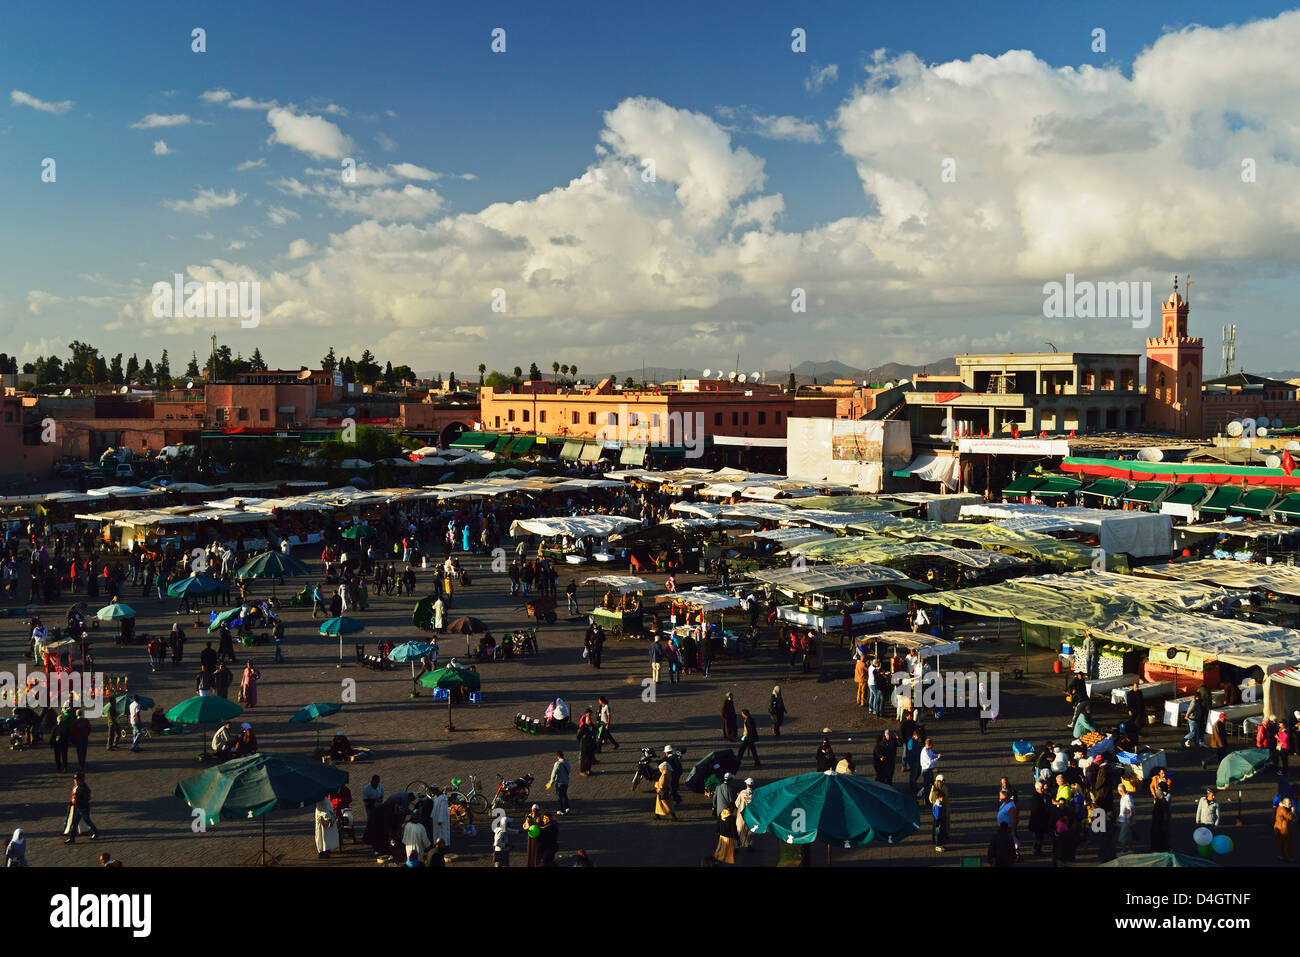 Jemaa El Fna, Medina, Marrakech, Marocco, Africa del Nord Immagini Stock